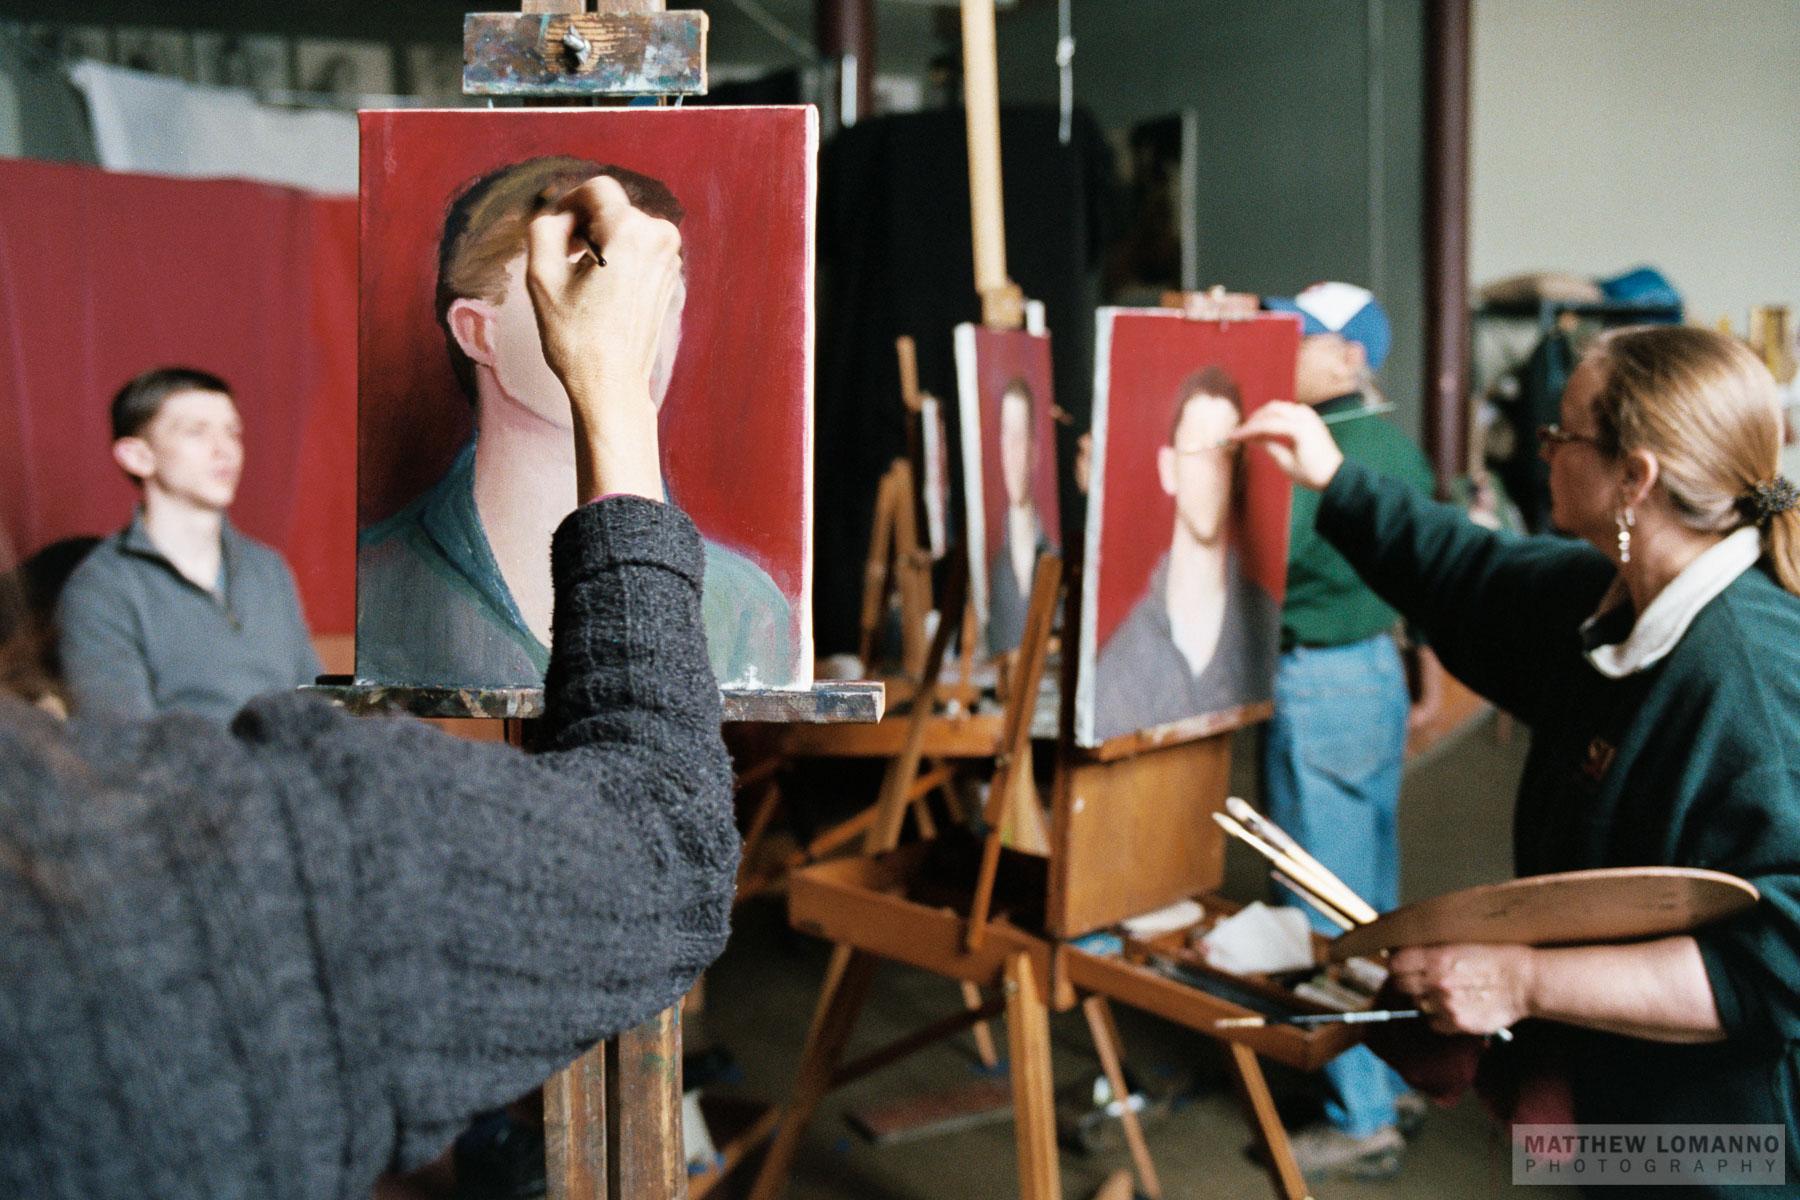 Ingbretson_atelier_working_by_Lomanno-5.jpg